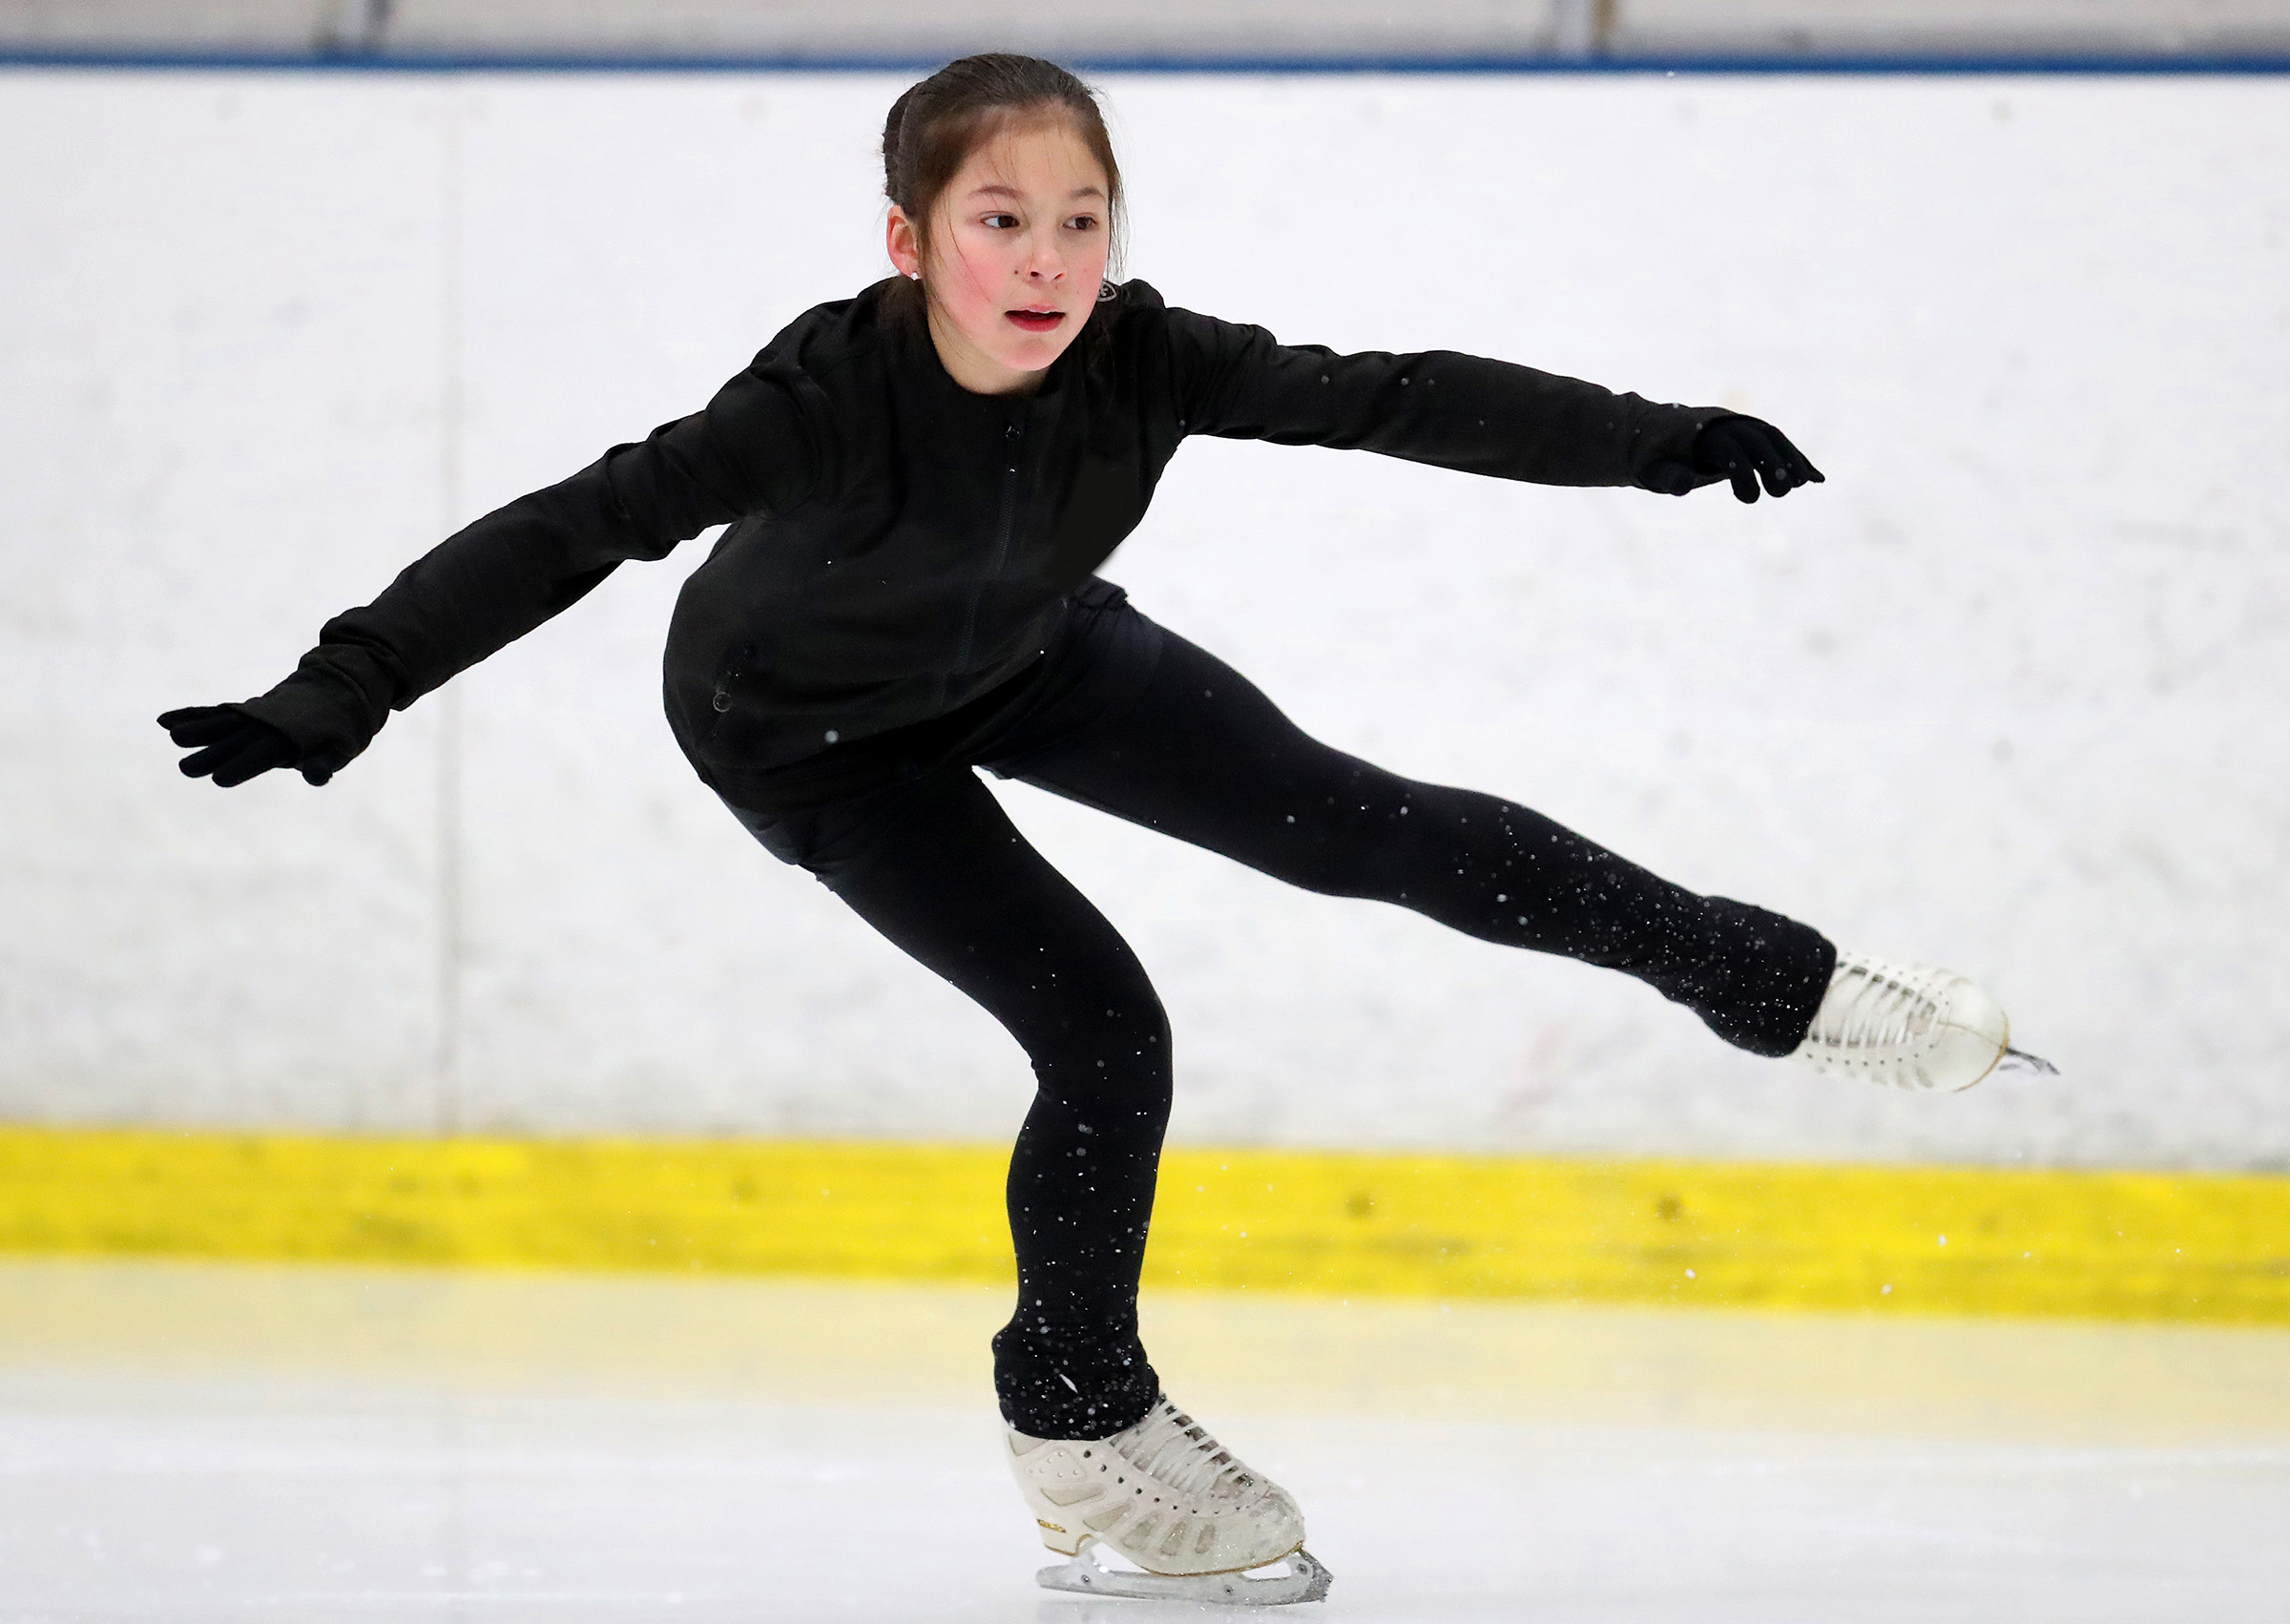 sjm-l-skate-xxxx-2.jpg